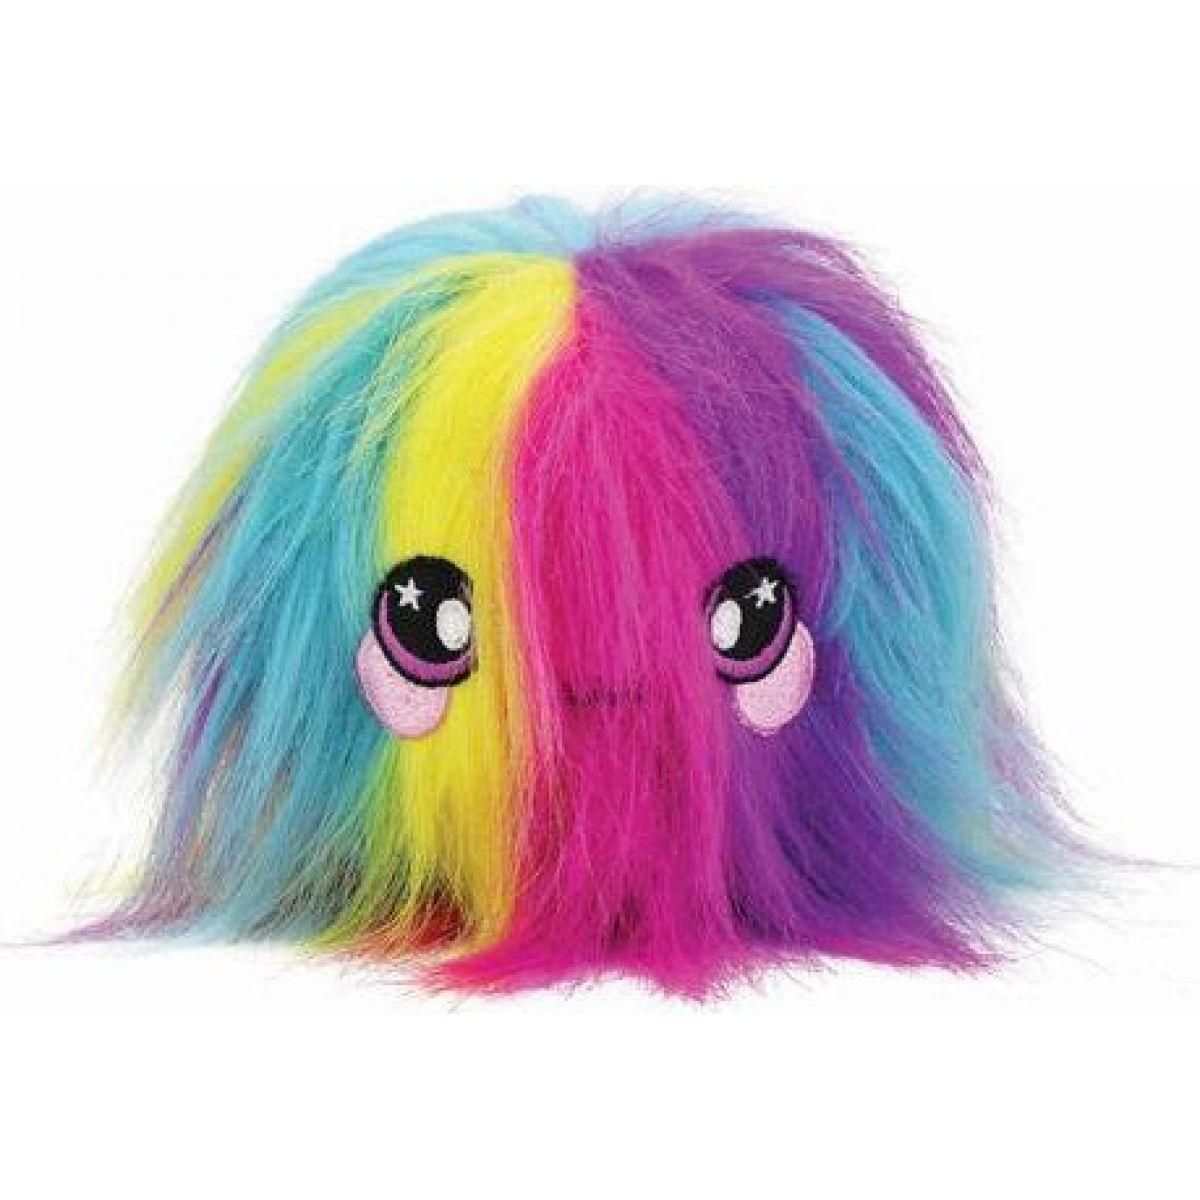 Squeezamals měkké plyšové zvířátko 9 cm Chlupáč barevný